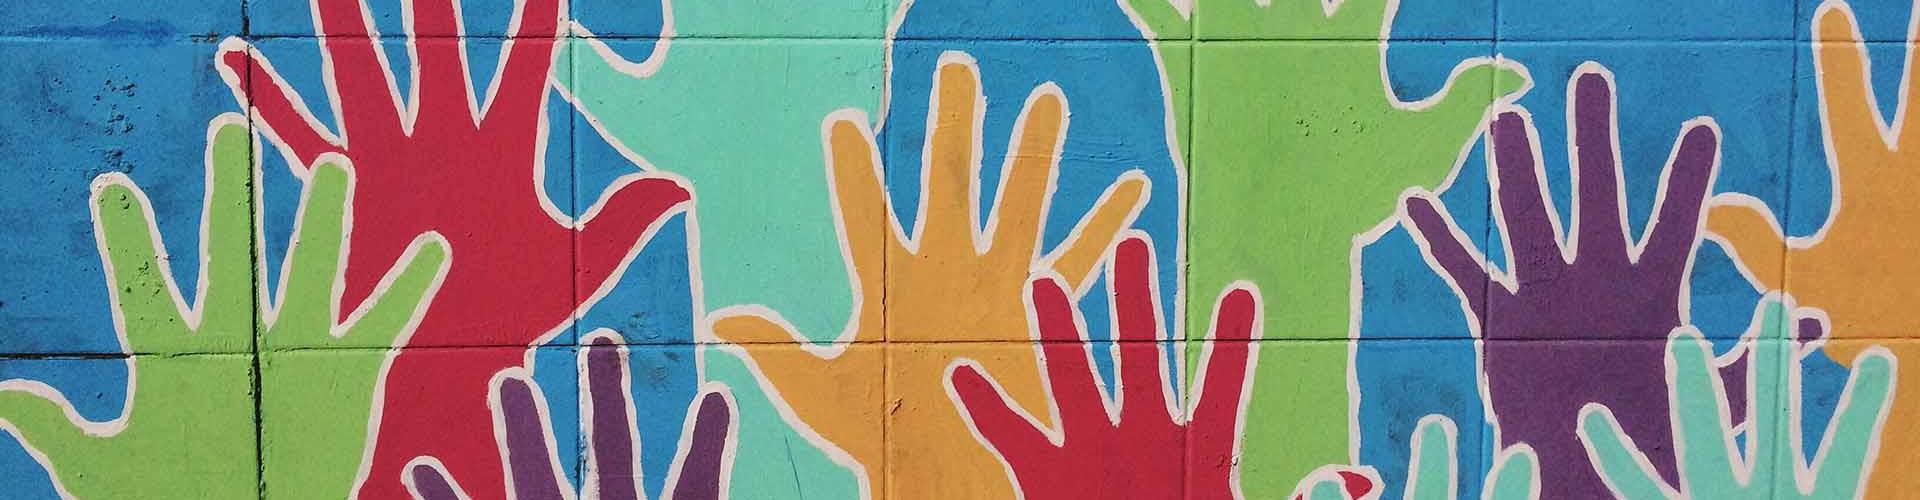 A mural featuring hands